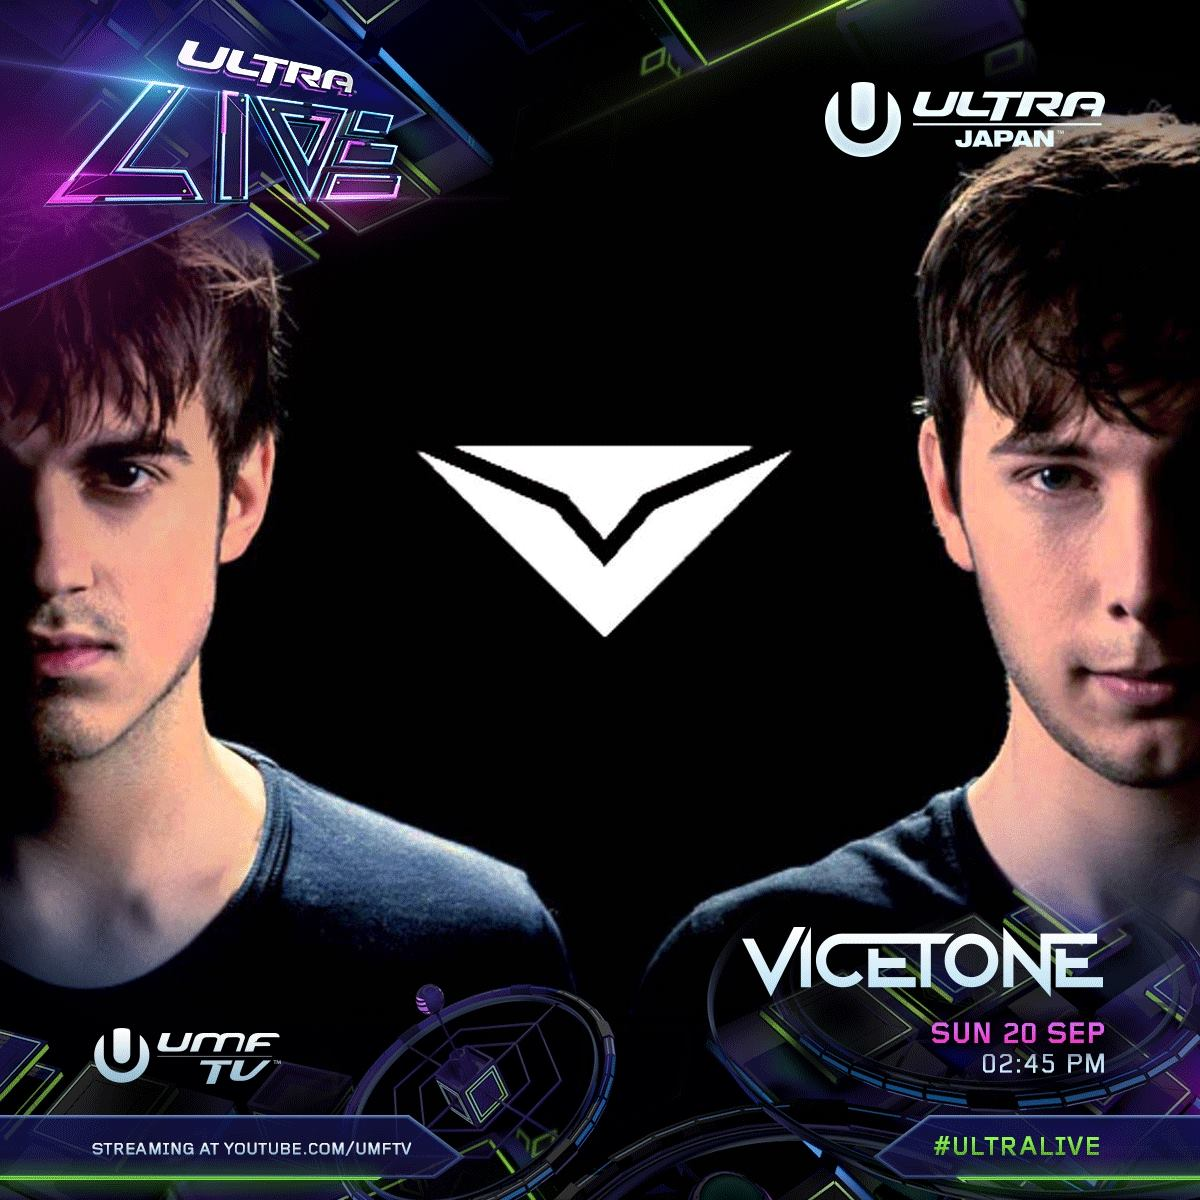 ULTRA JAPAN 2015 Vicetone